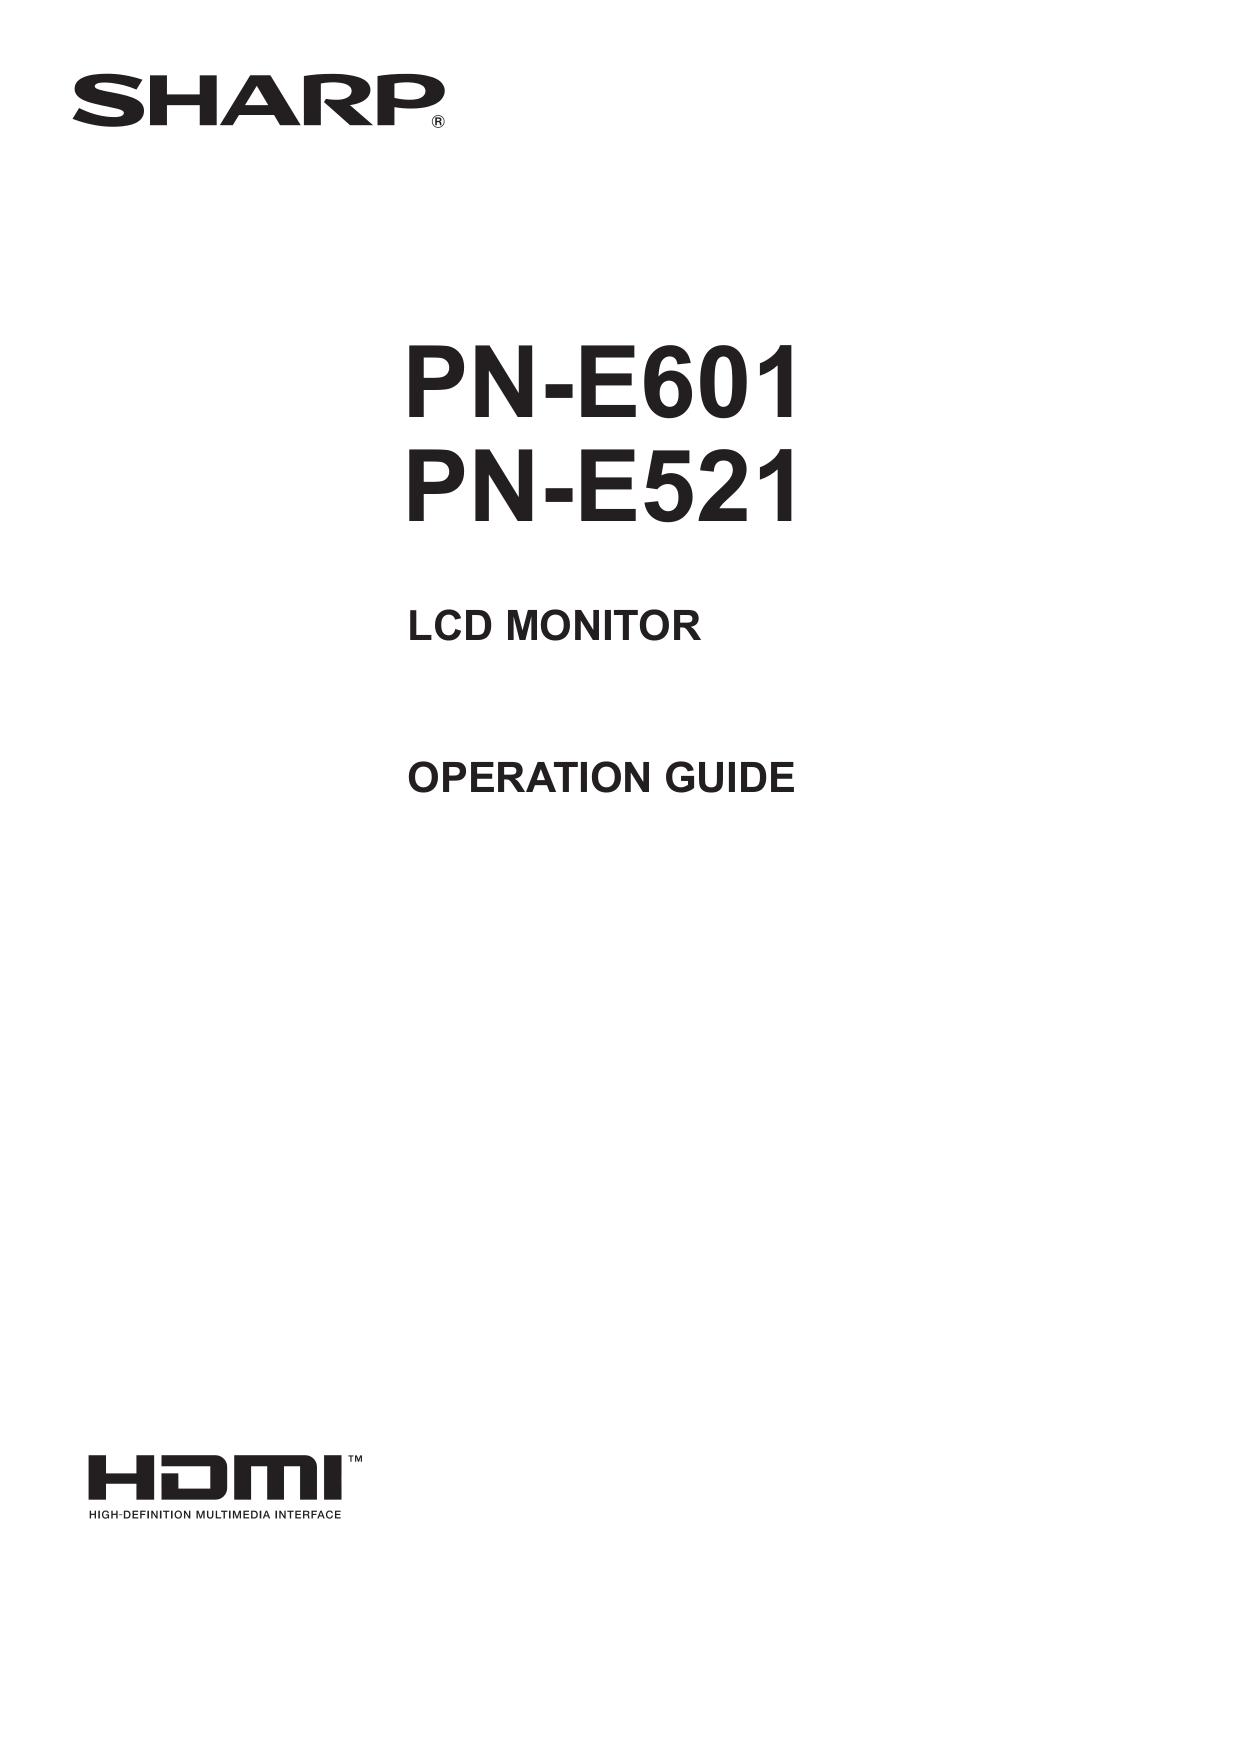 Download free pdf for Sharp PN-E601 Monitor manual